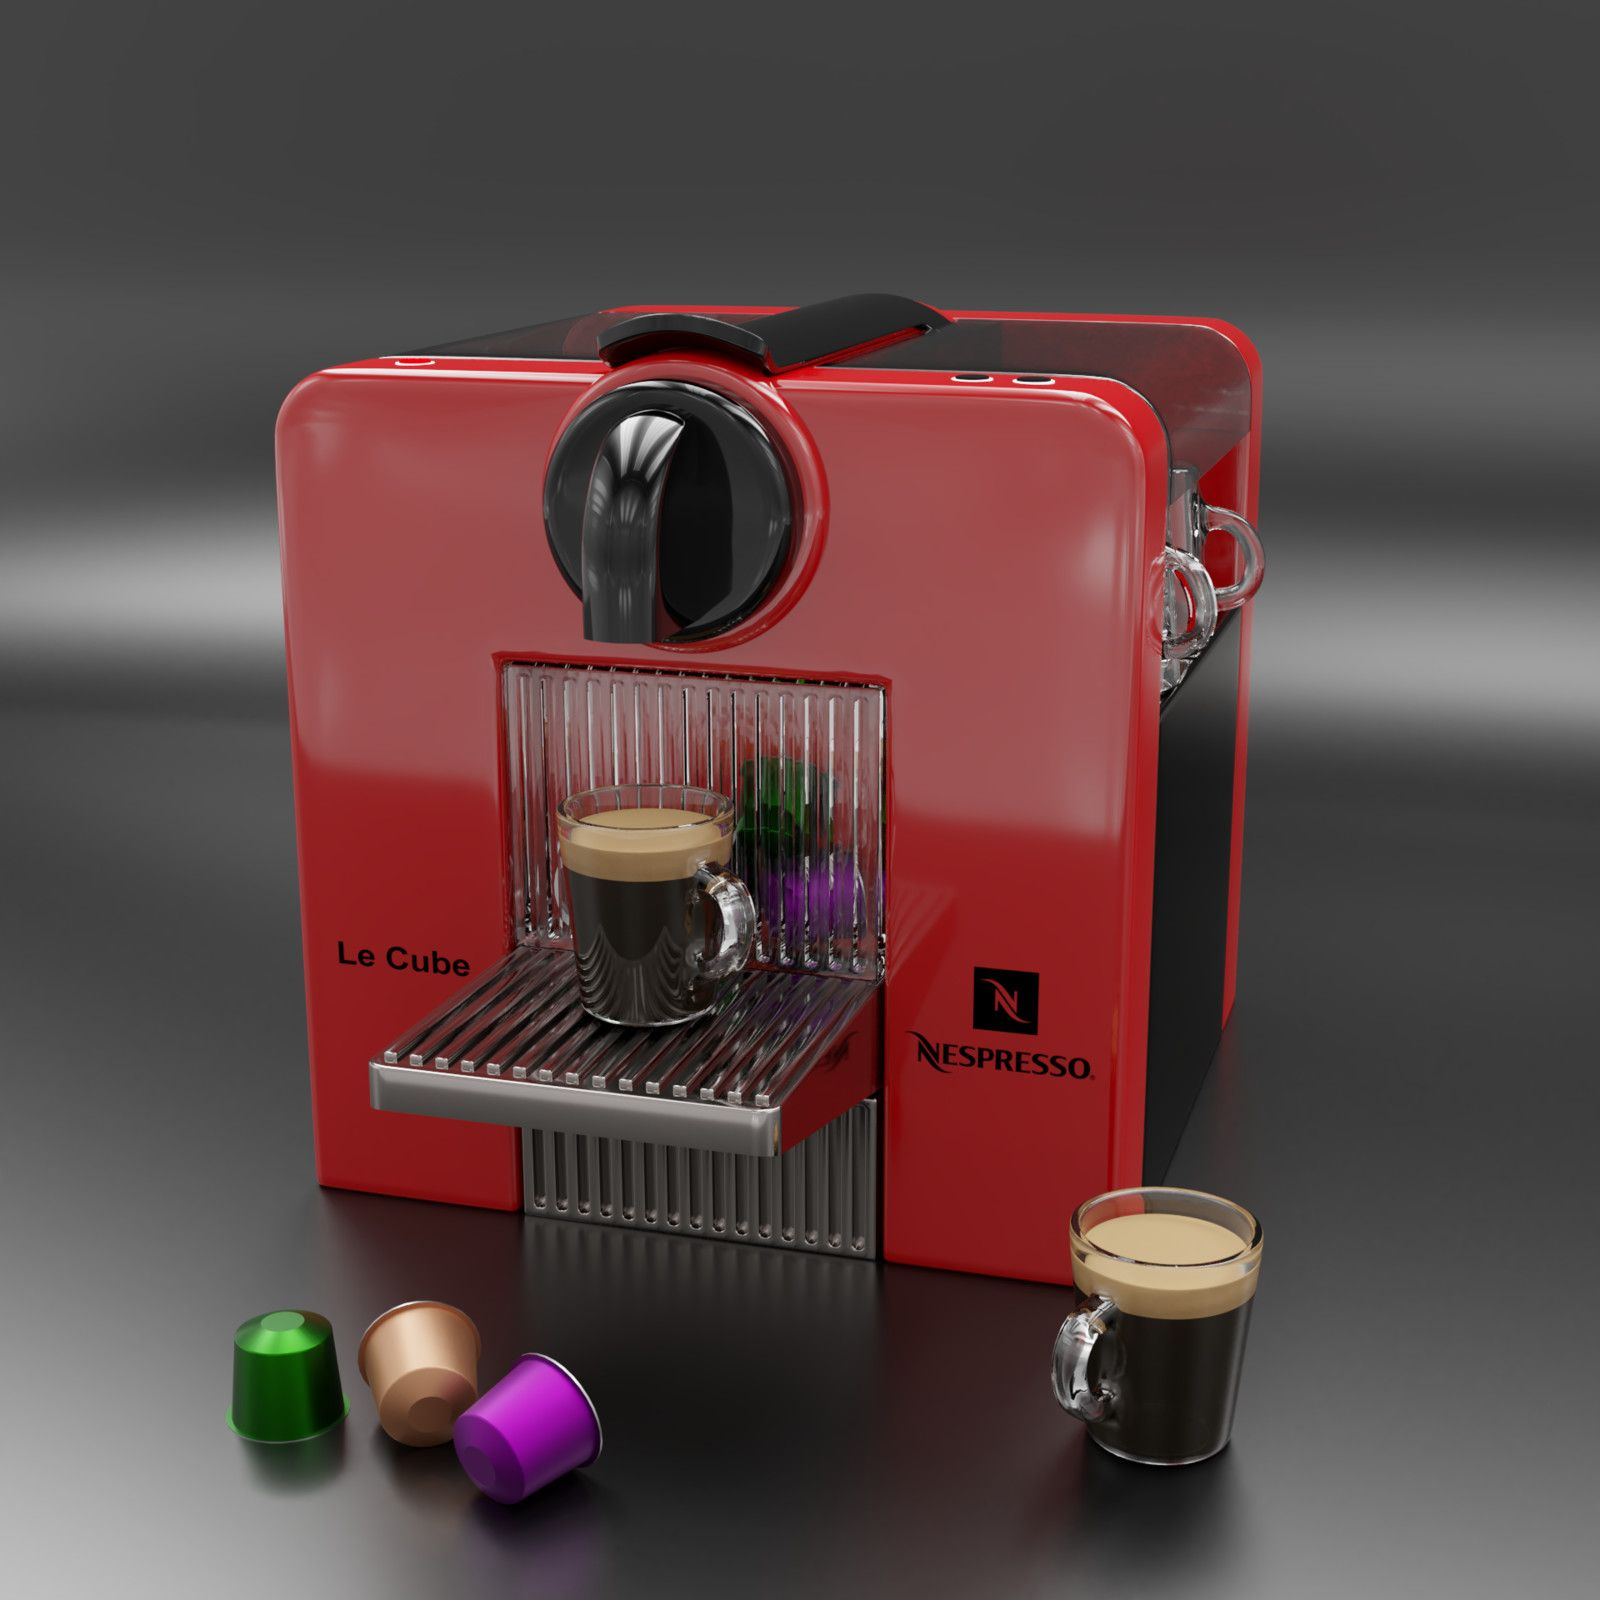 Coffee Machine Francis Mercure On Artstation At Https Www Artstation Com Artwork A2kwx Coffee Machine Coffee Nespresso